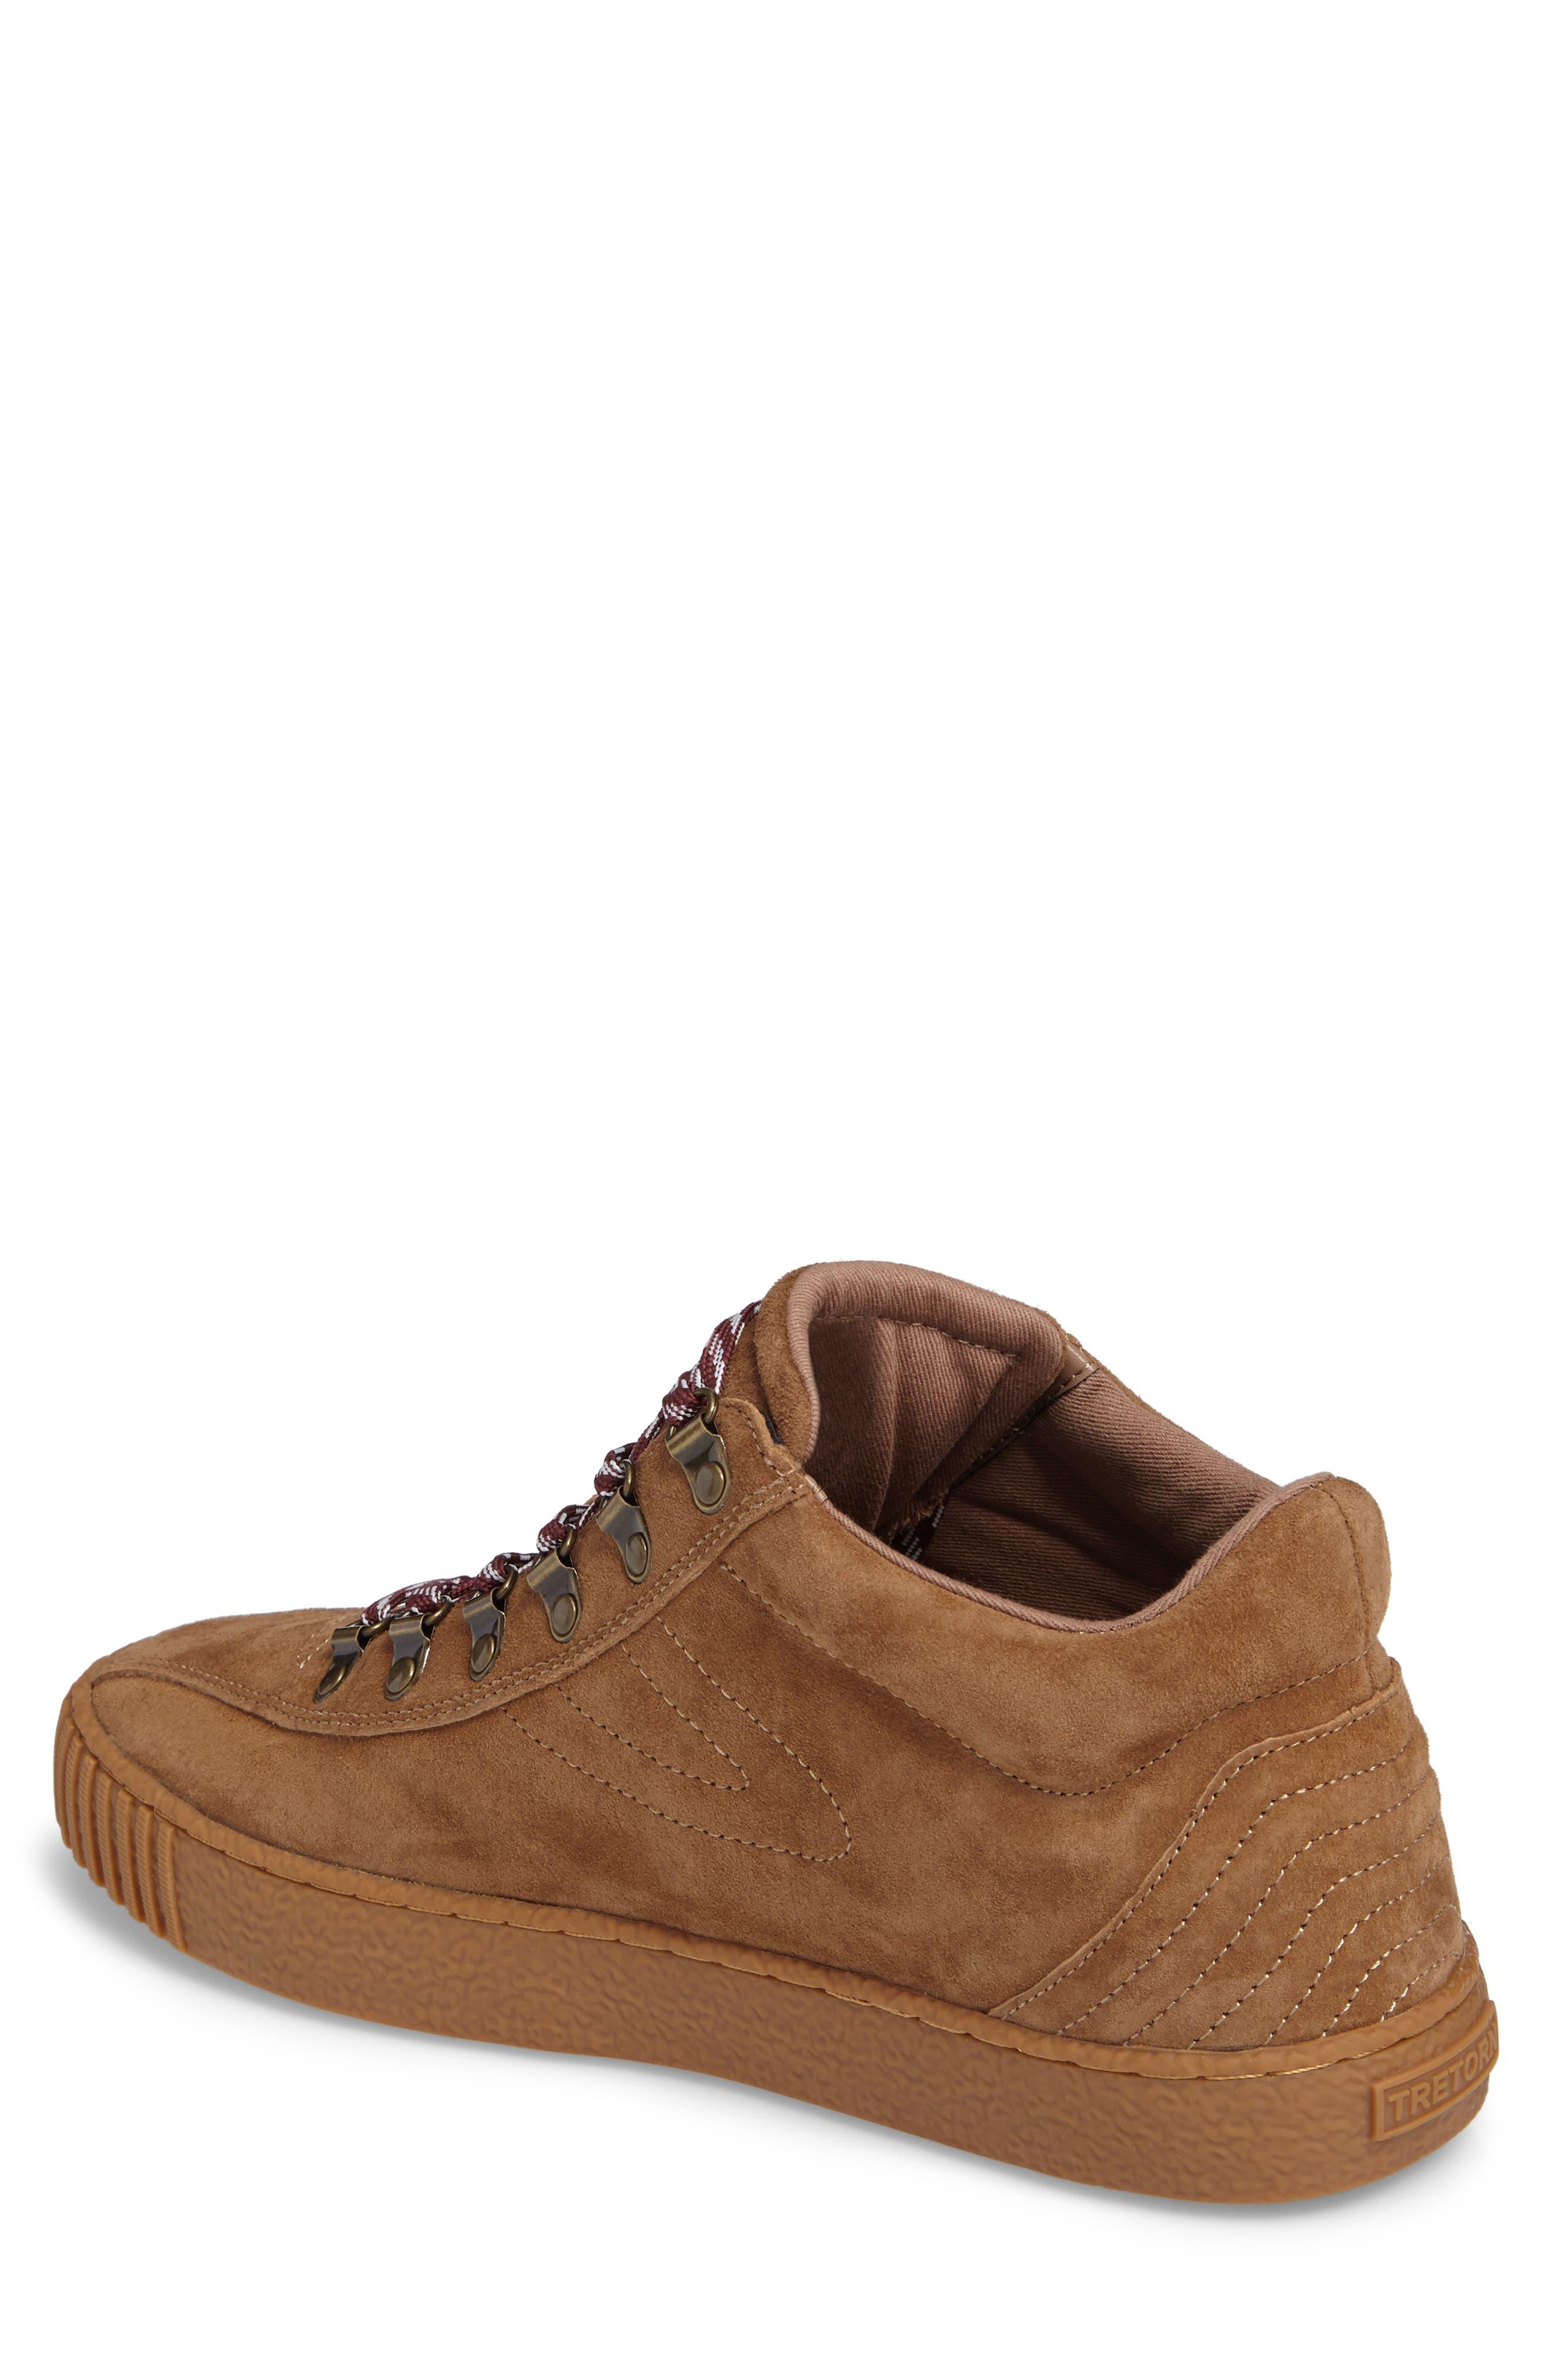 Dante 3 Sneaker,                             Alternate thumbnail 2, color,                             CIGAR NUBUCK